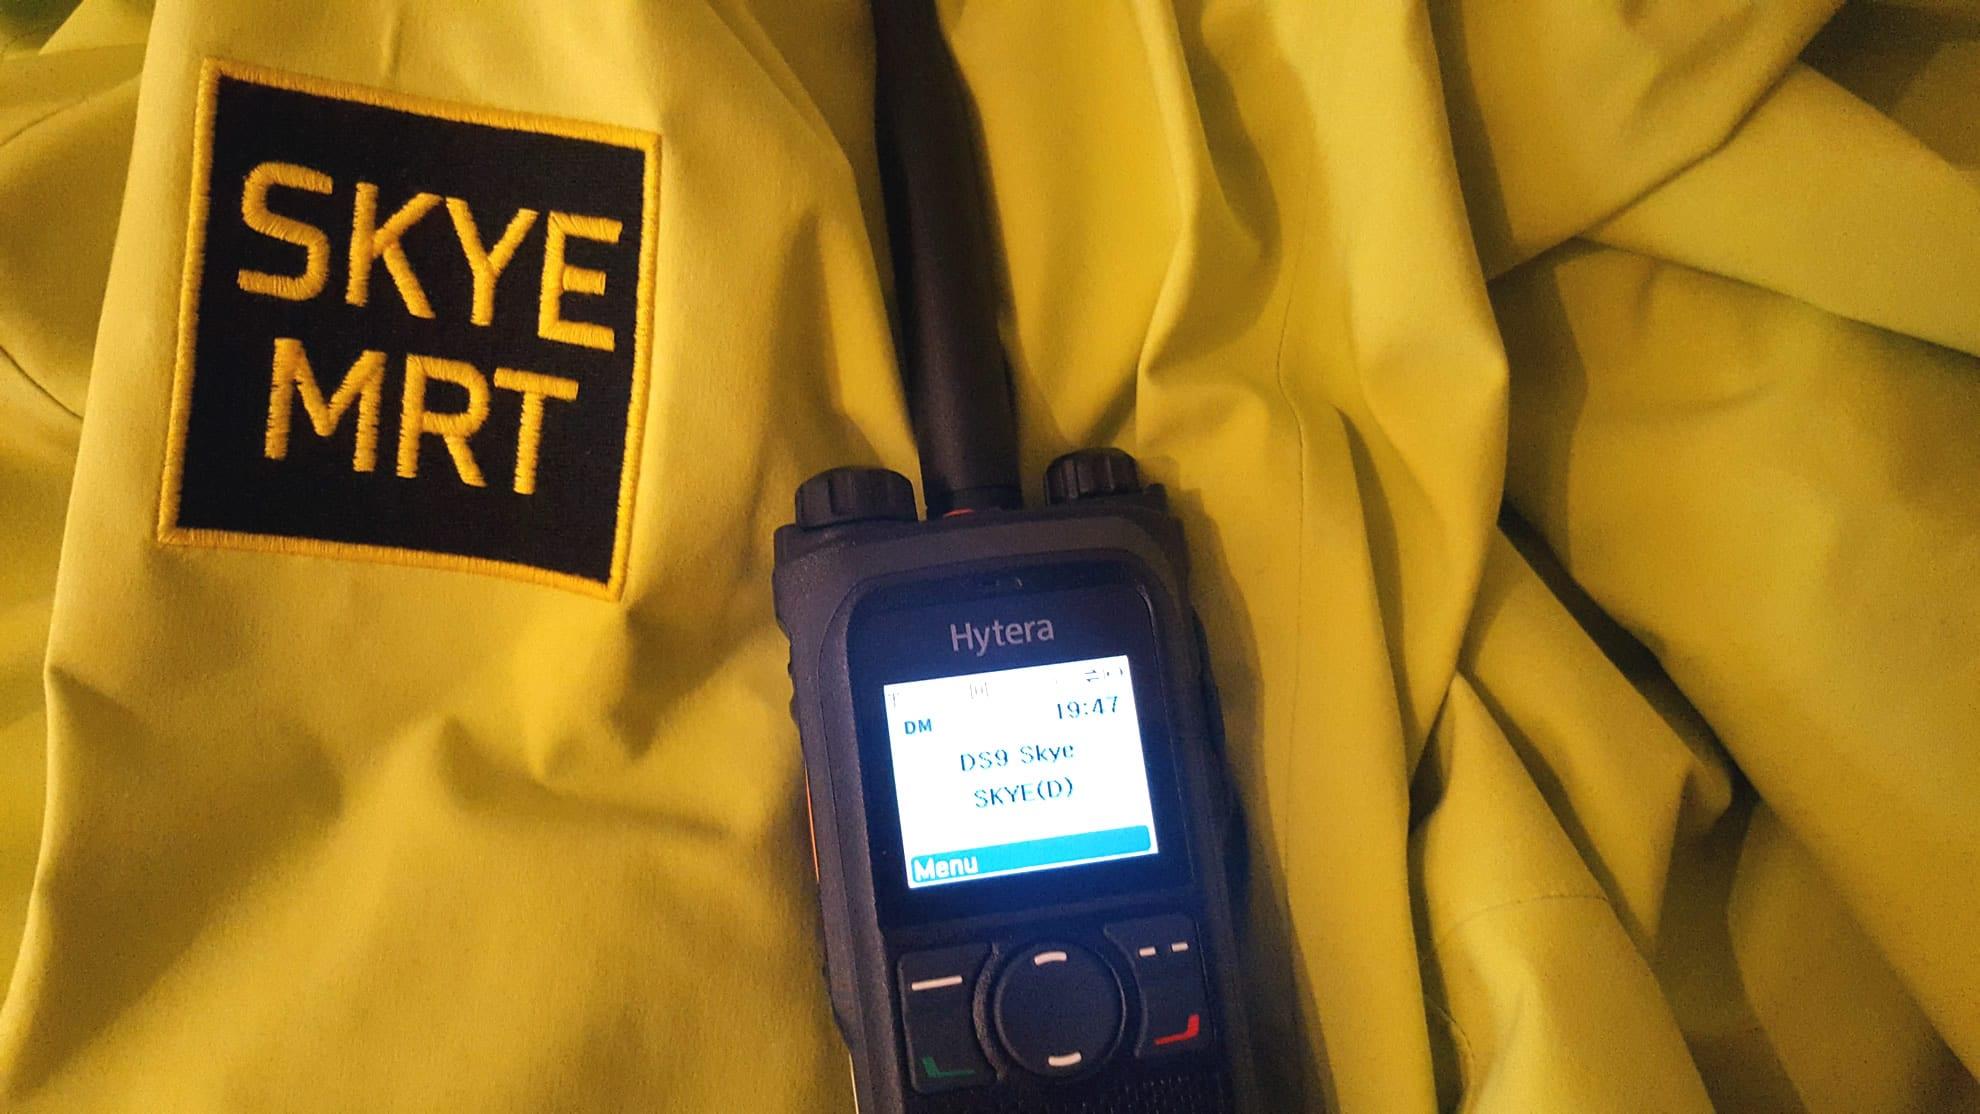 Skye MRT communication equipment